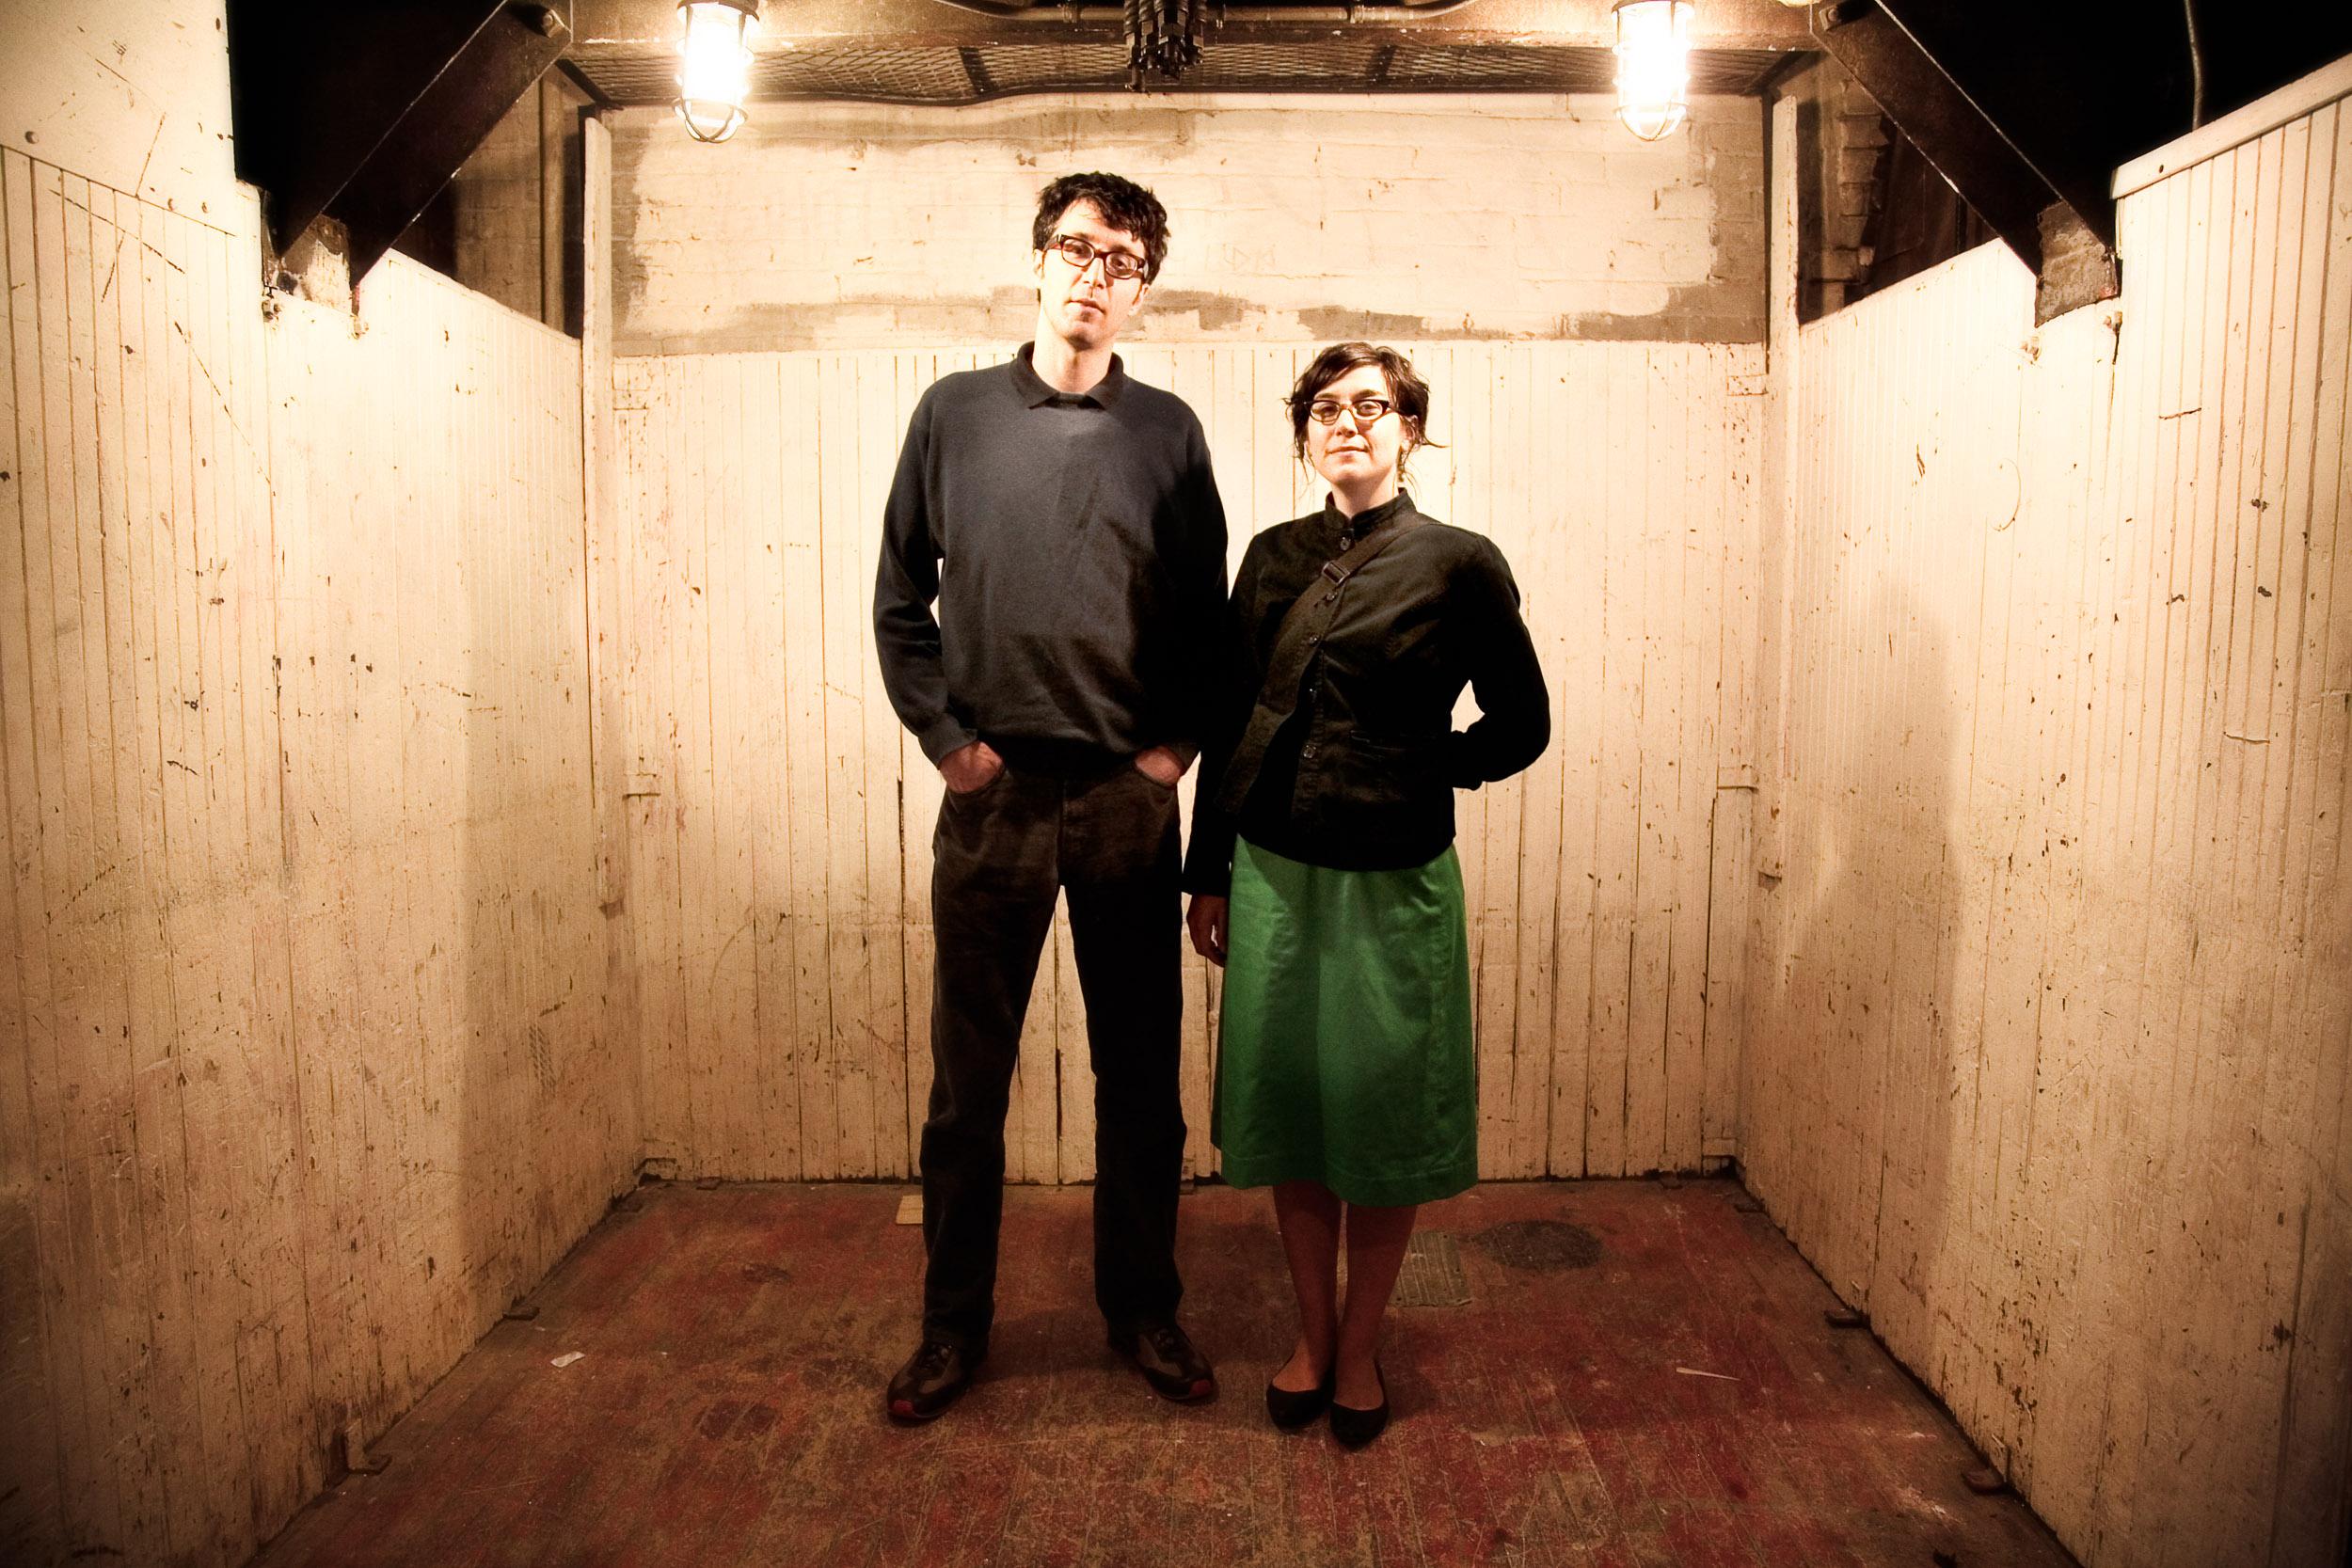 Phil Burke, Melanie Emerson